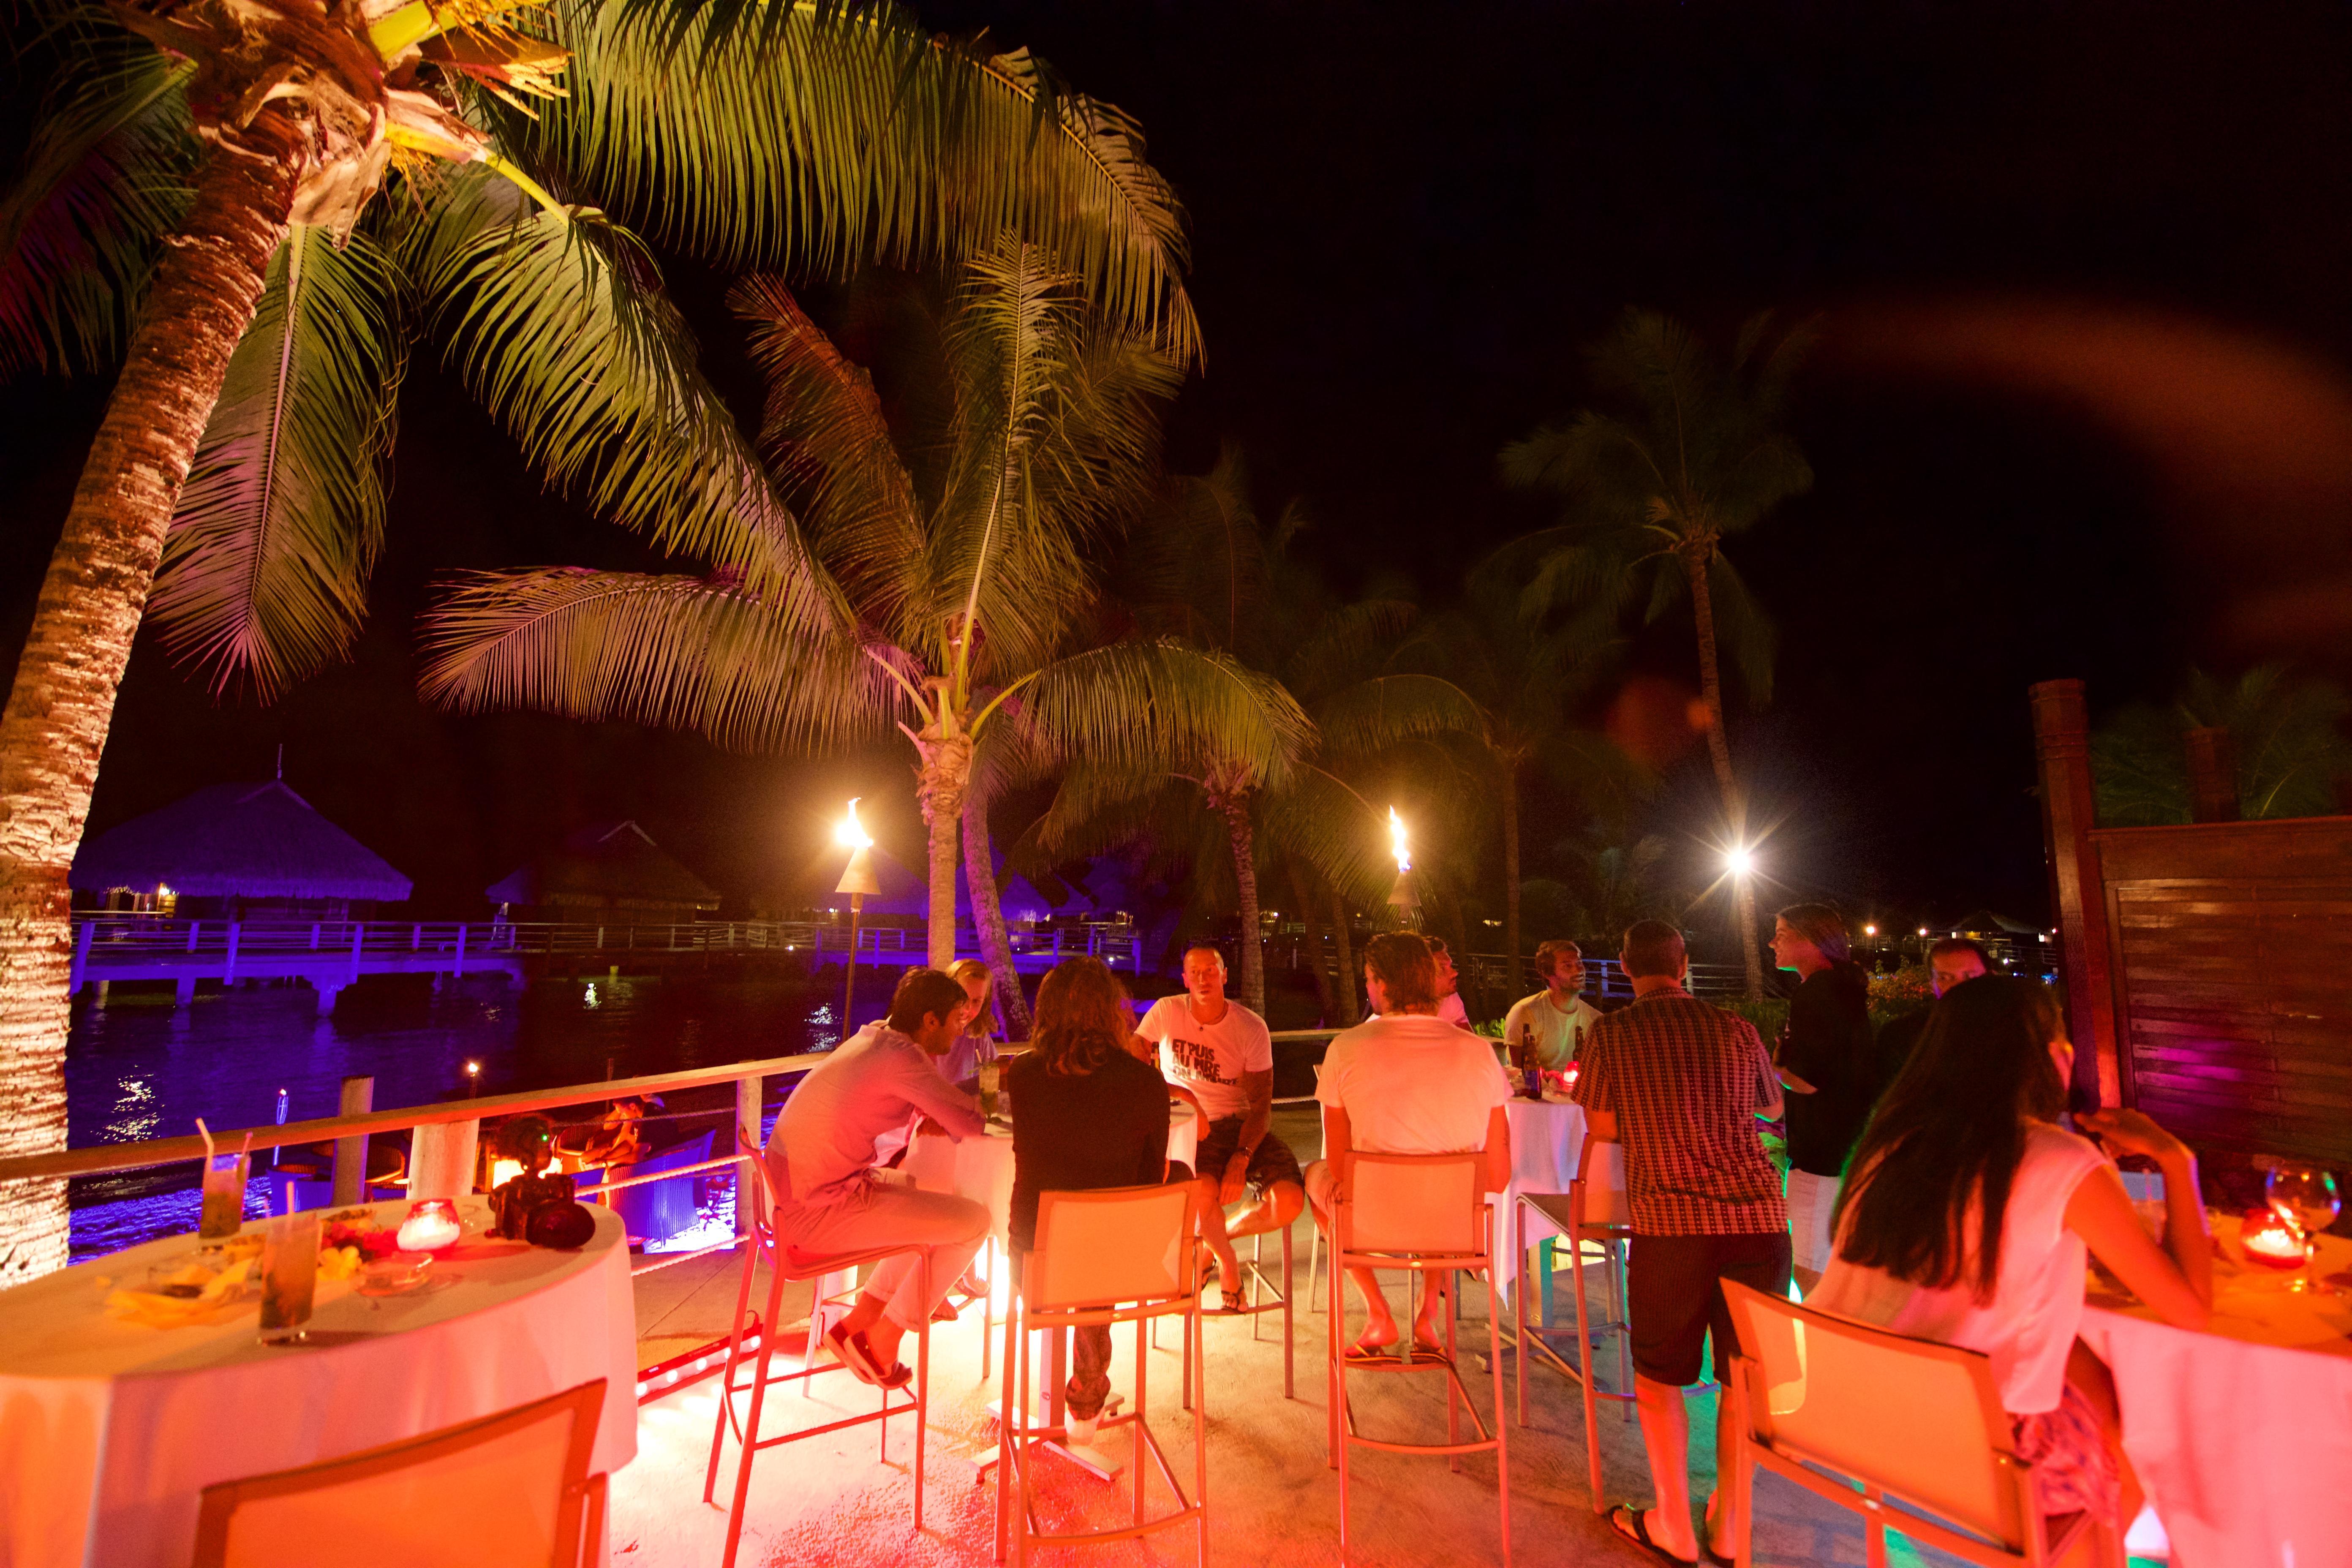 https://tahititourisme.de/wp-content/uploads/2018/03/RESTAURATION-Matahiehani-Lounge-Bar-featured_image-Tim_McKenna.jpg